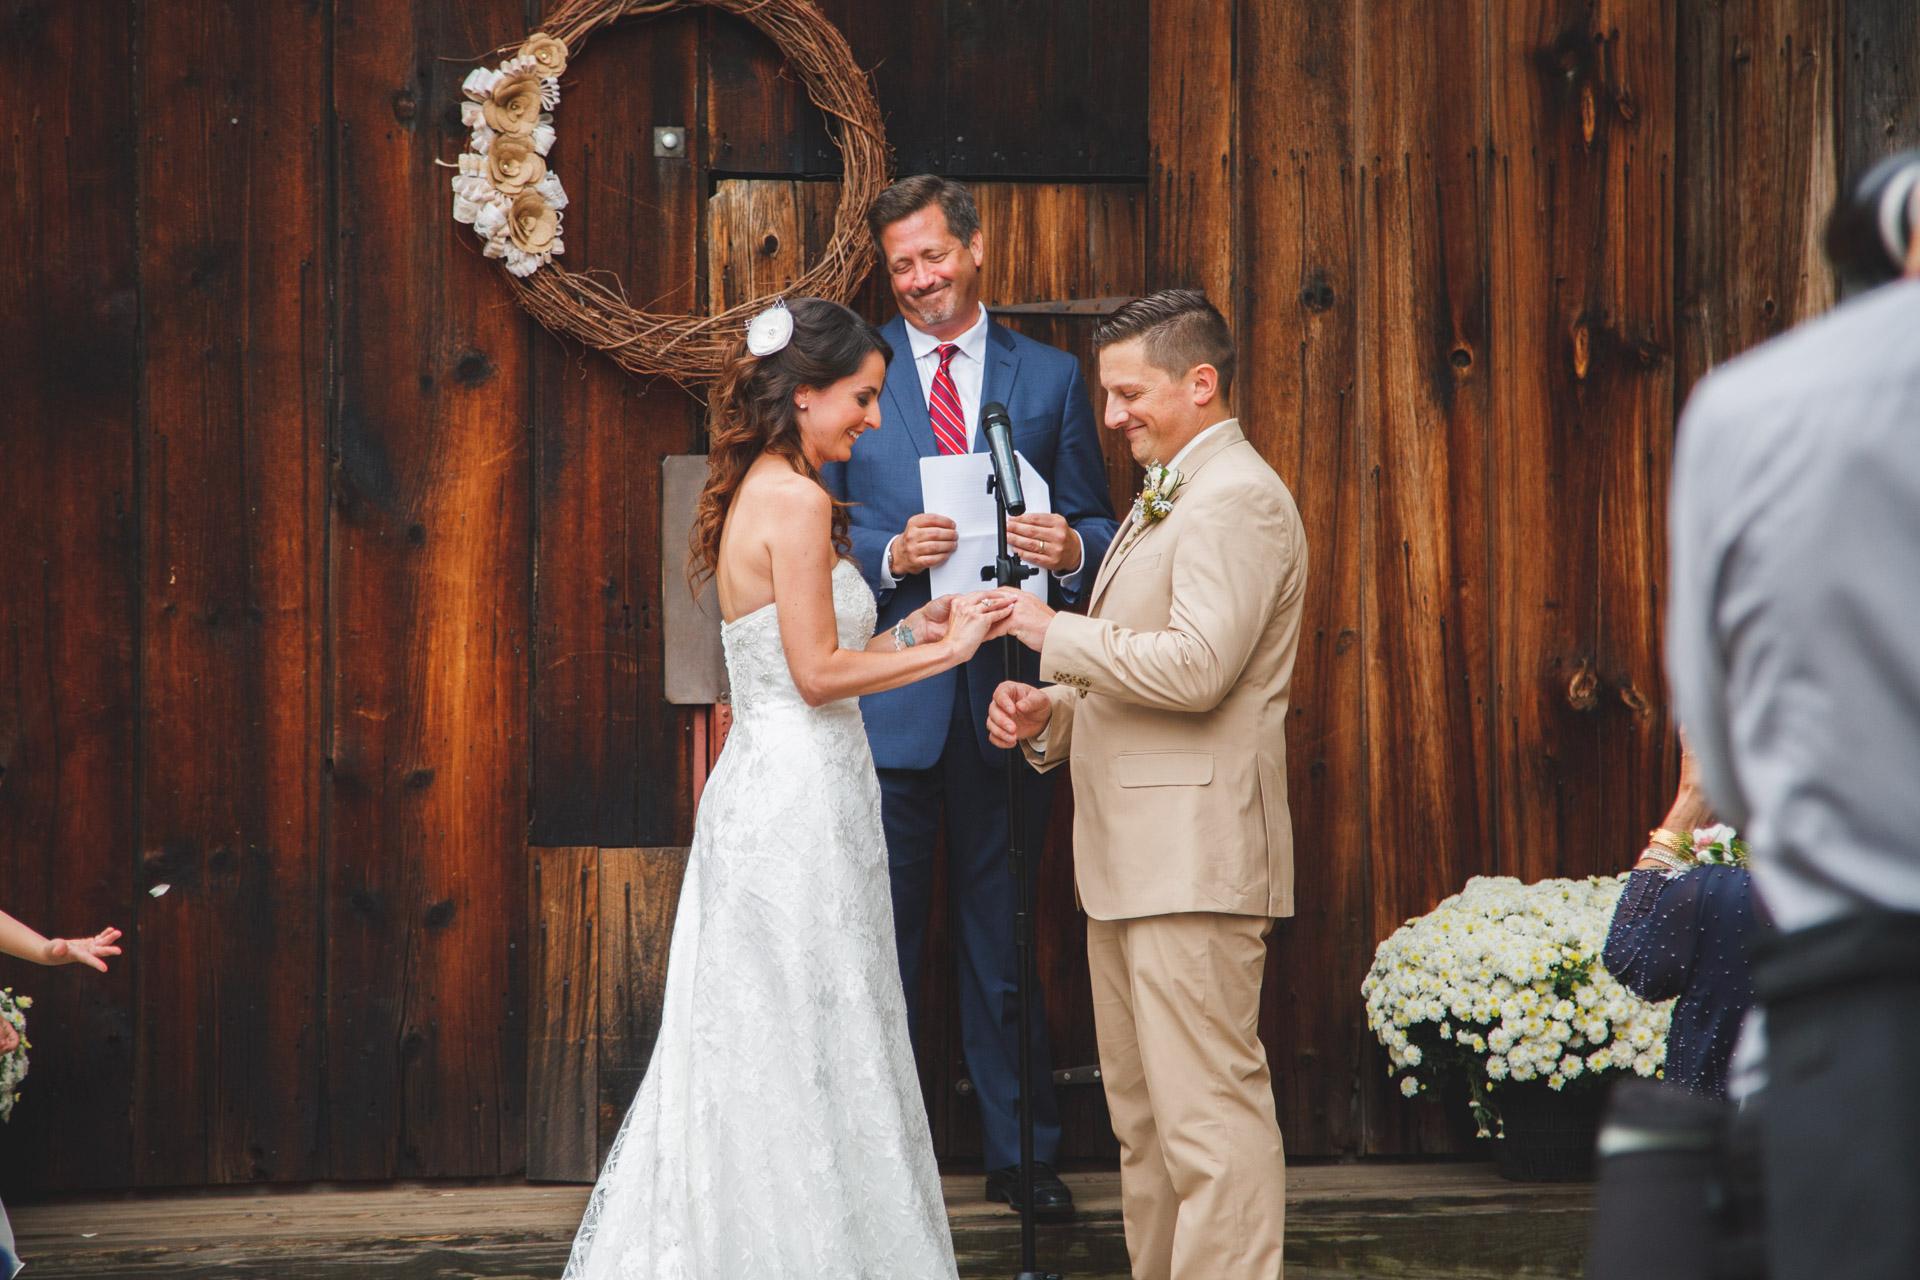 Wedding Photos at Webb Barn Wethersfield -18.jpg